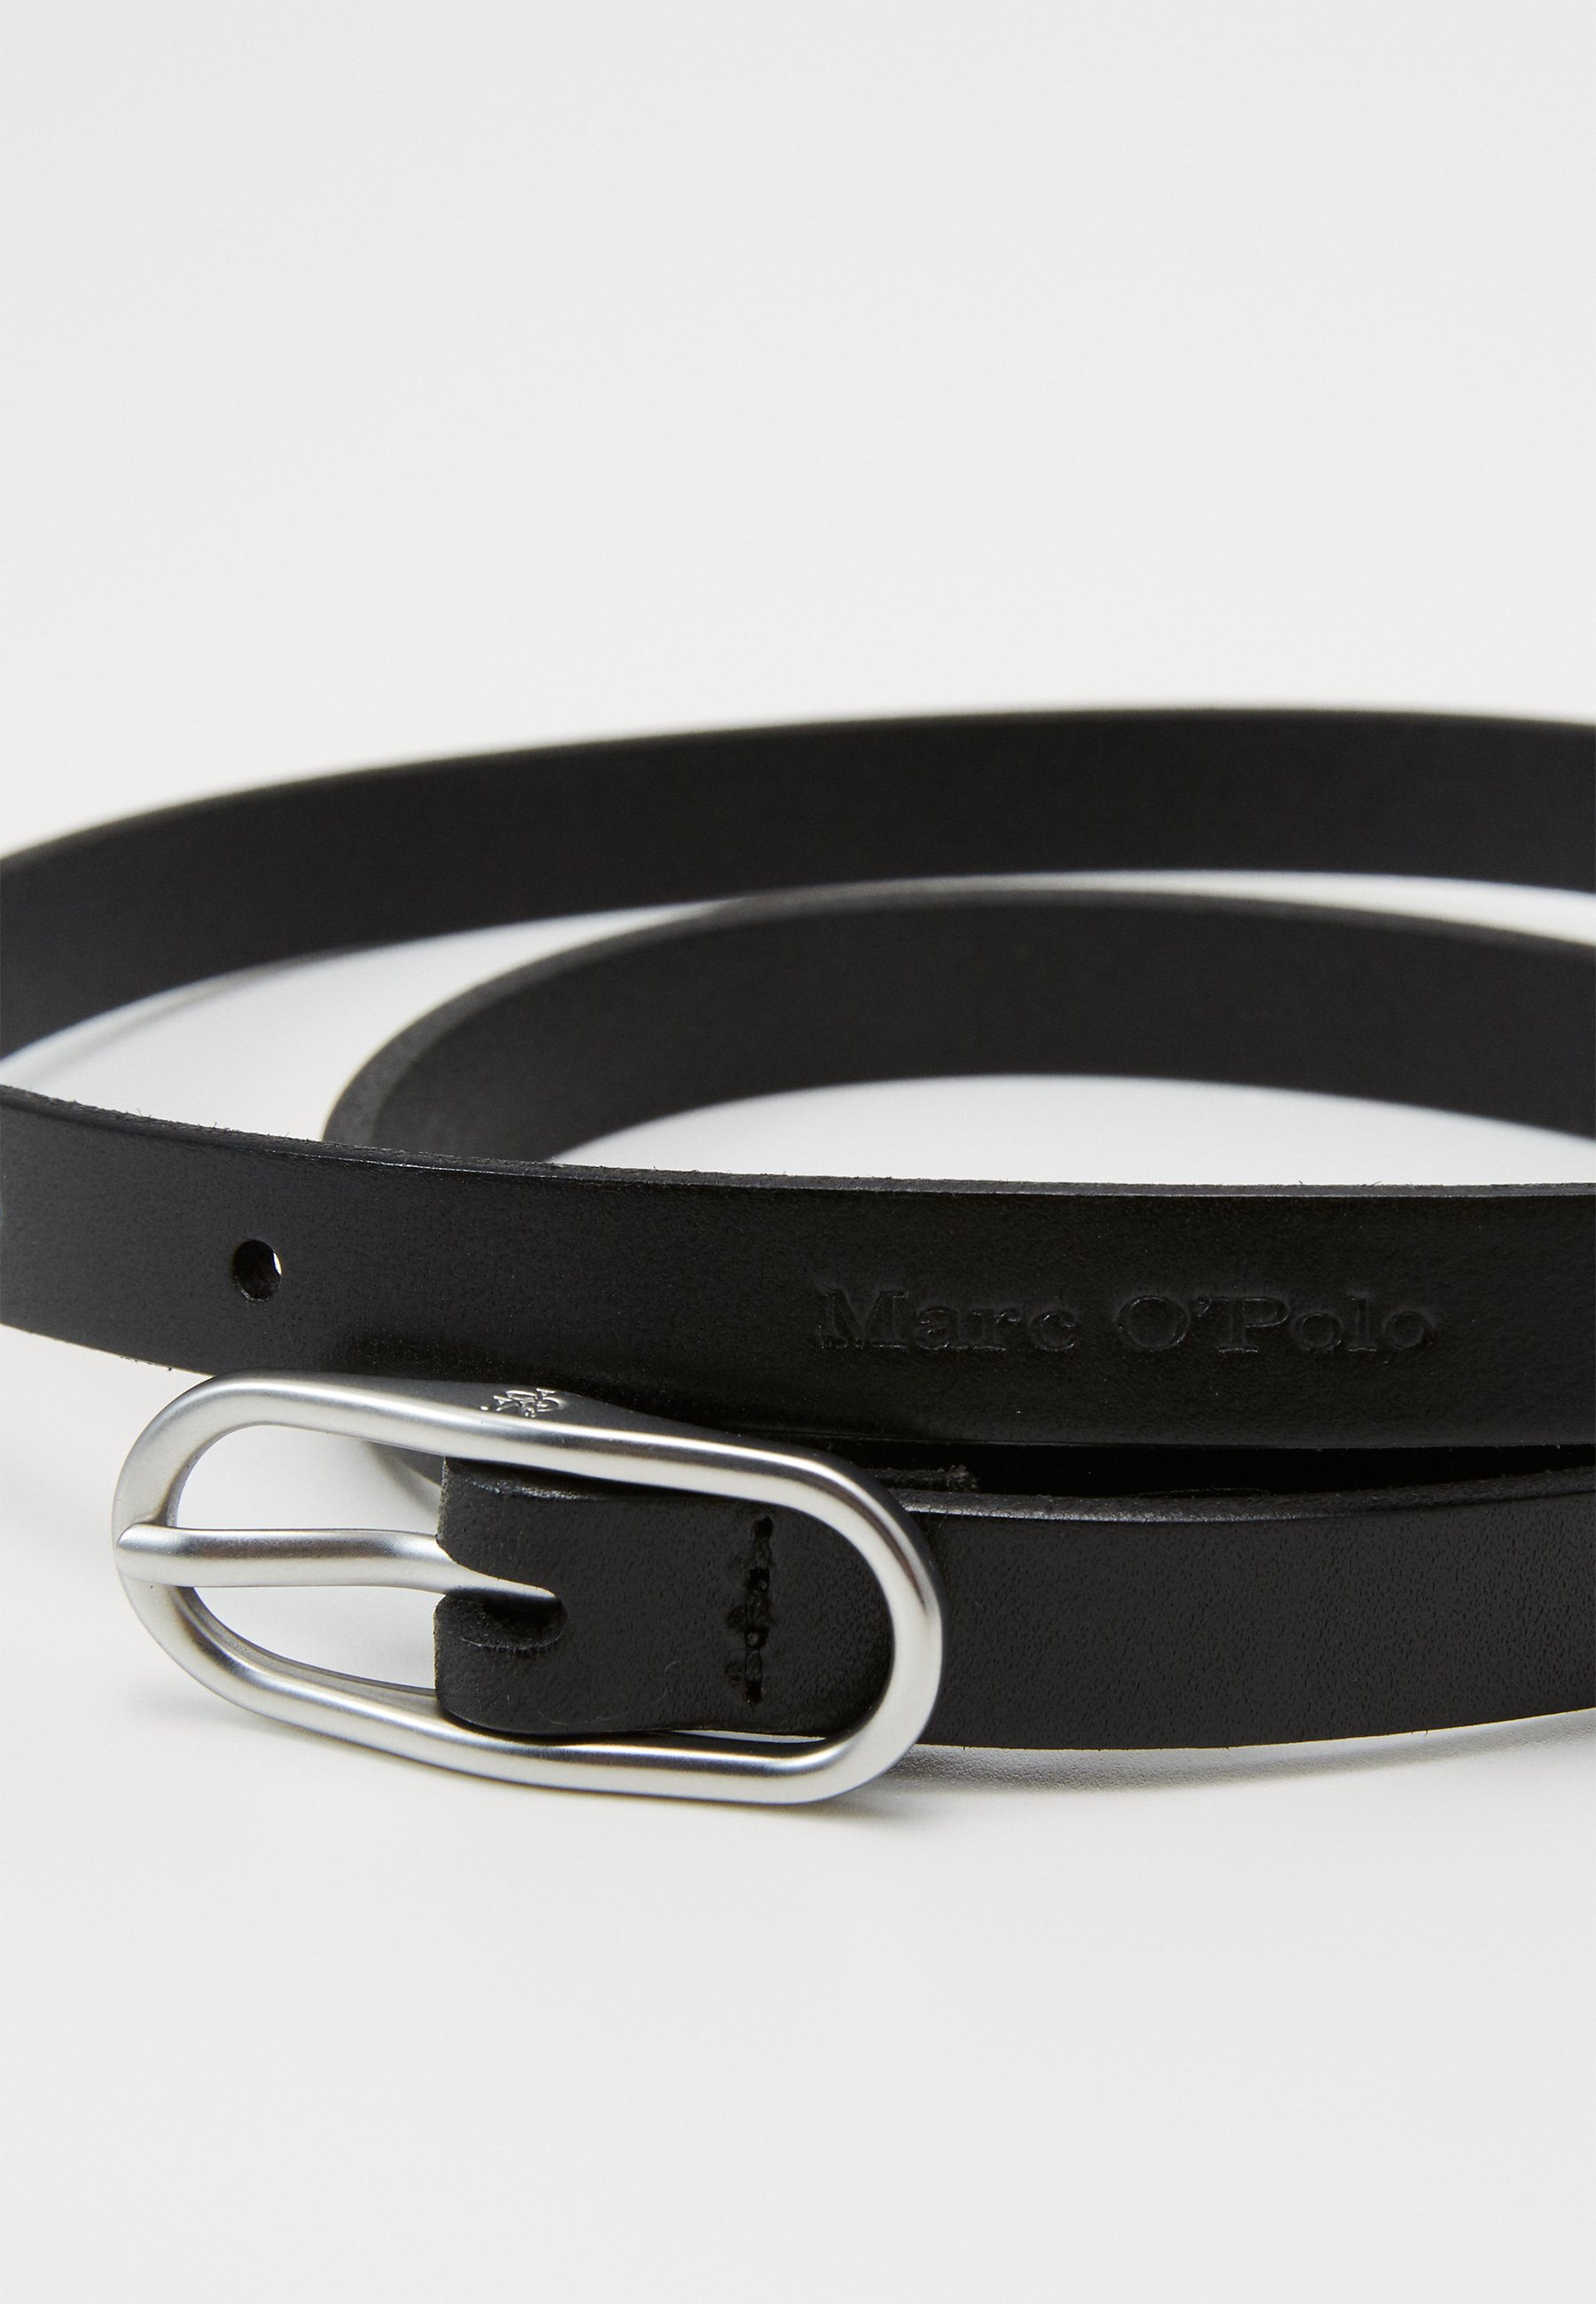 Marc O'Polo BELT LADIES - Belte - black/svart PoM8xj3BI0pZ3wv